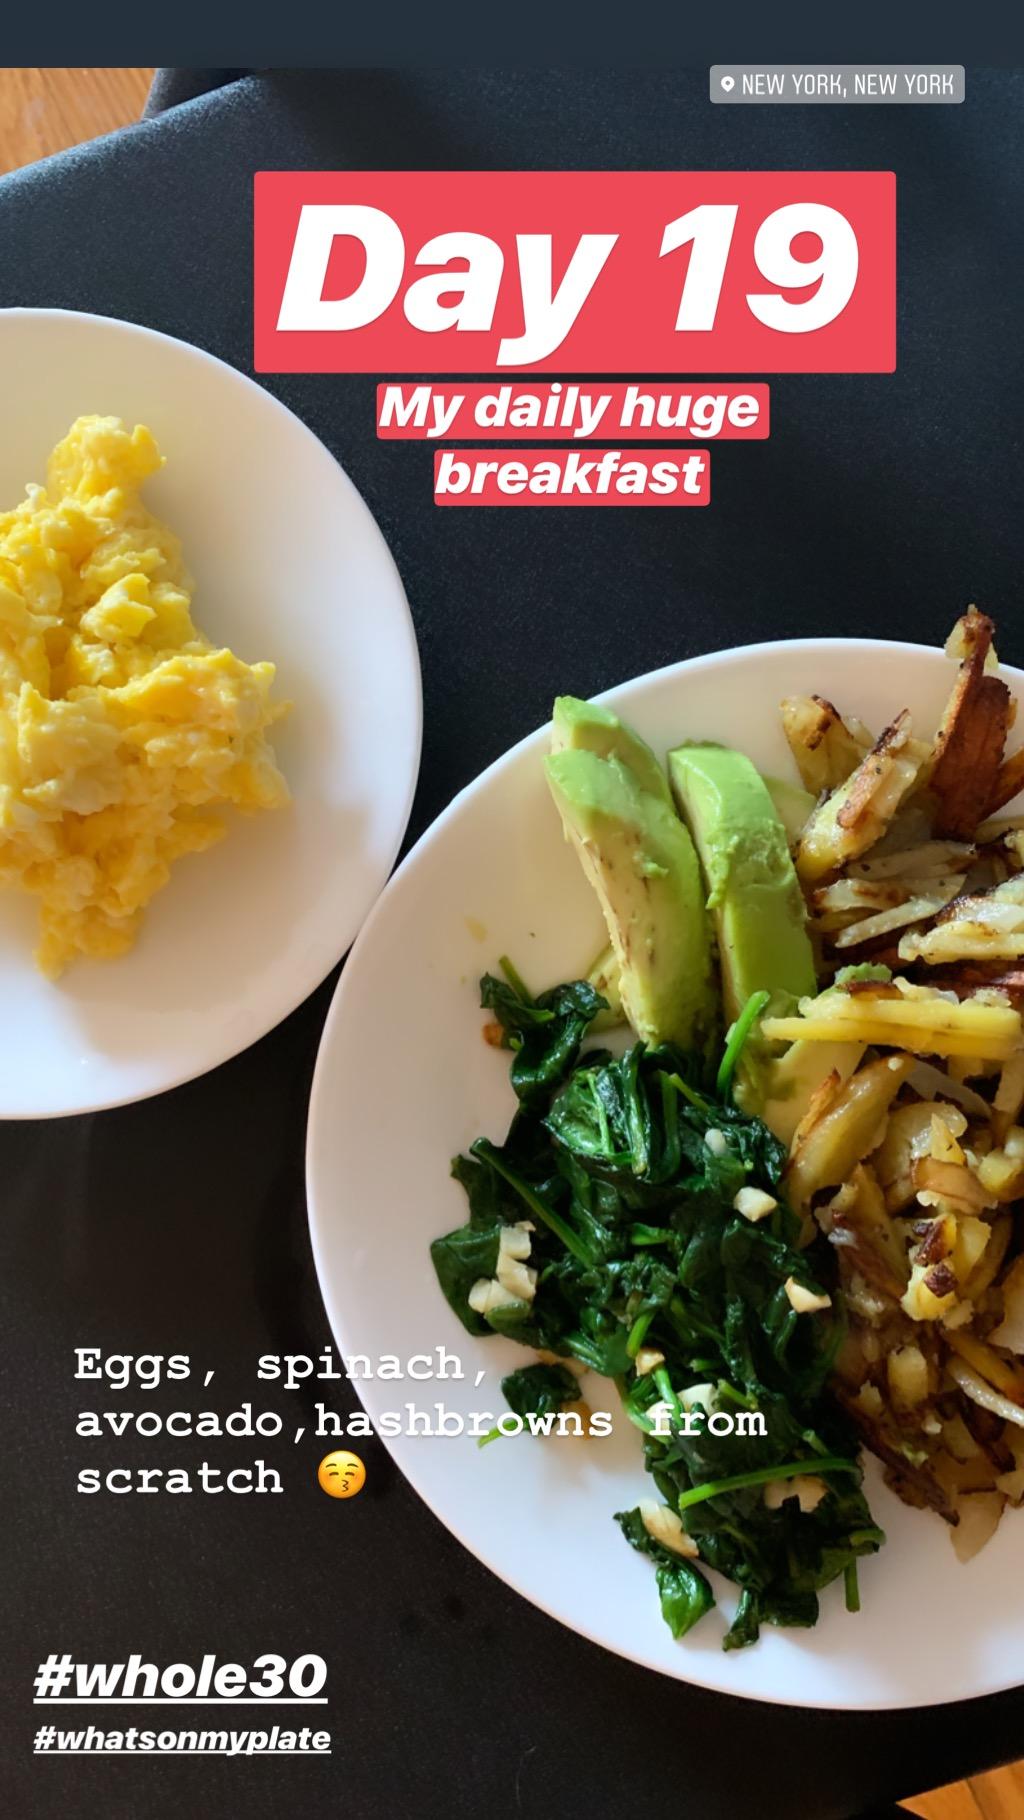 whole30 challenge cynthia chung food lifestyle change0038.JPG